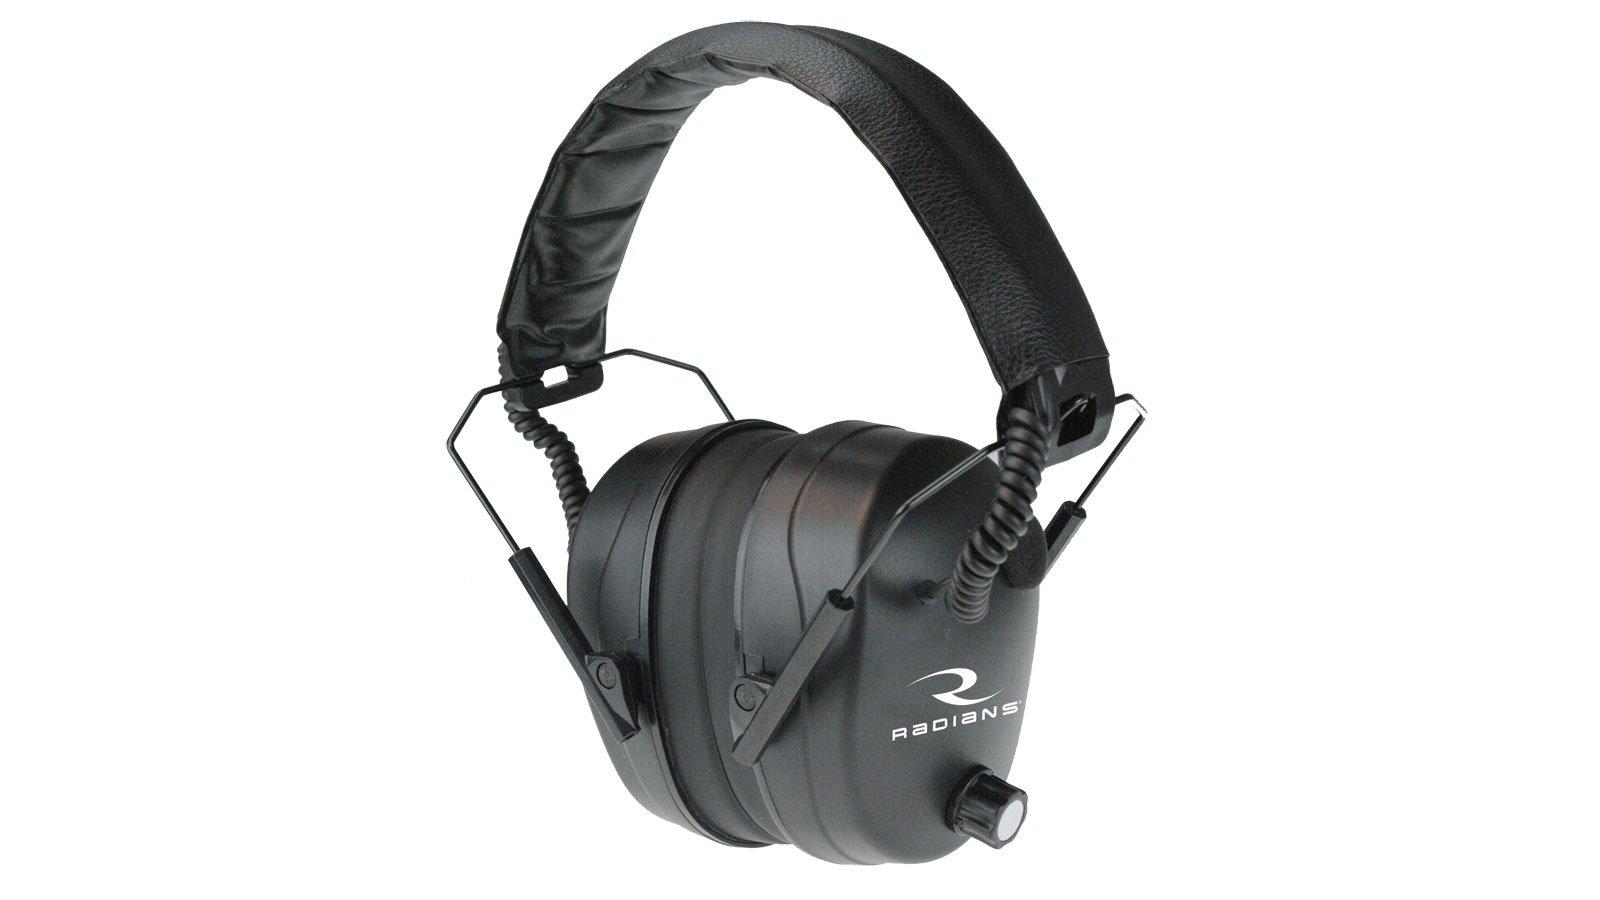 Radians 432-Ehp Electronic Ear Muff, Black